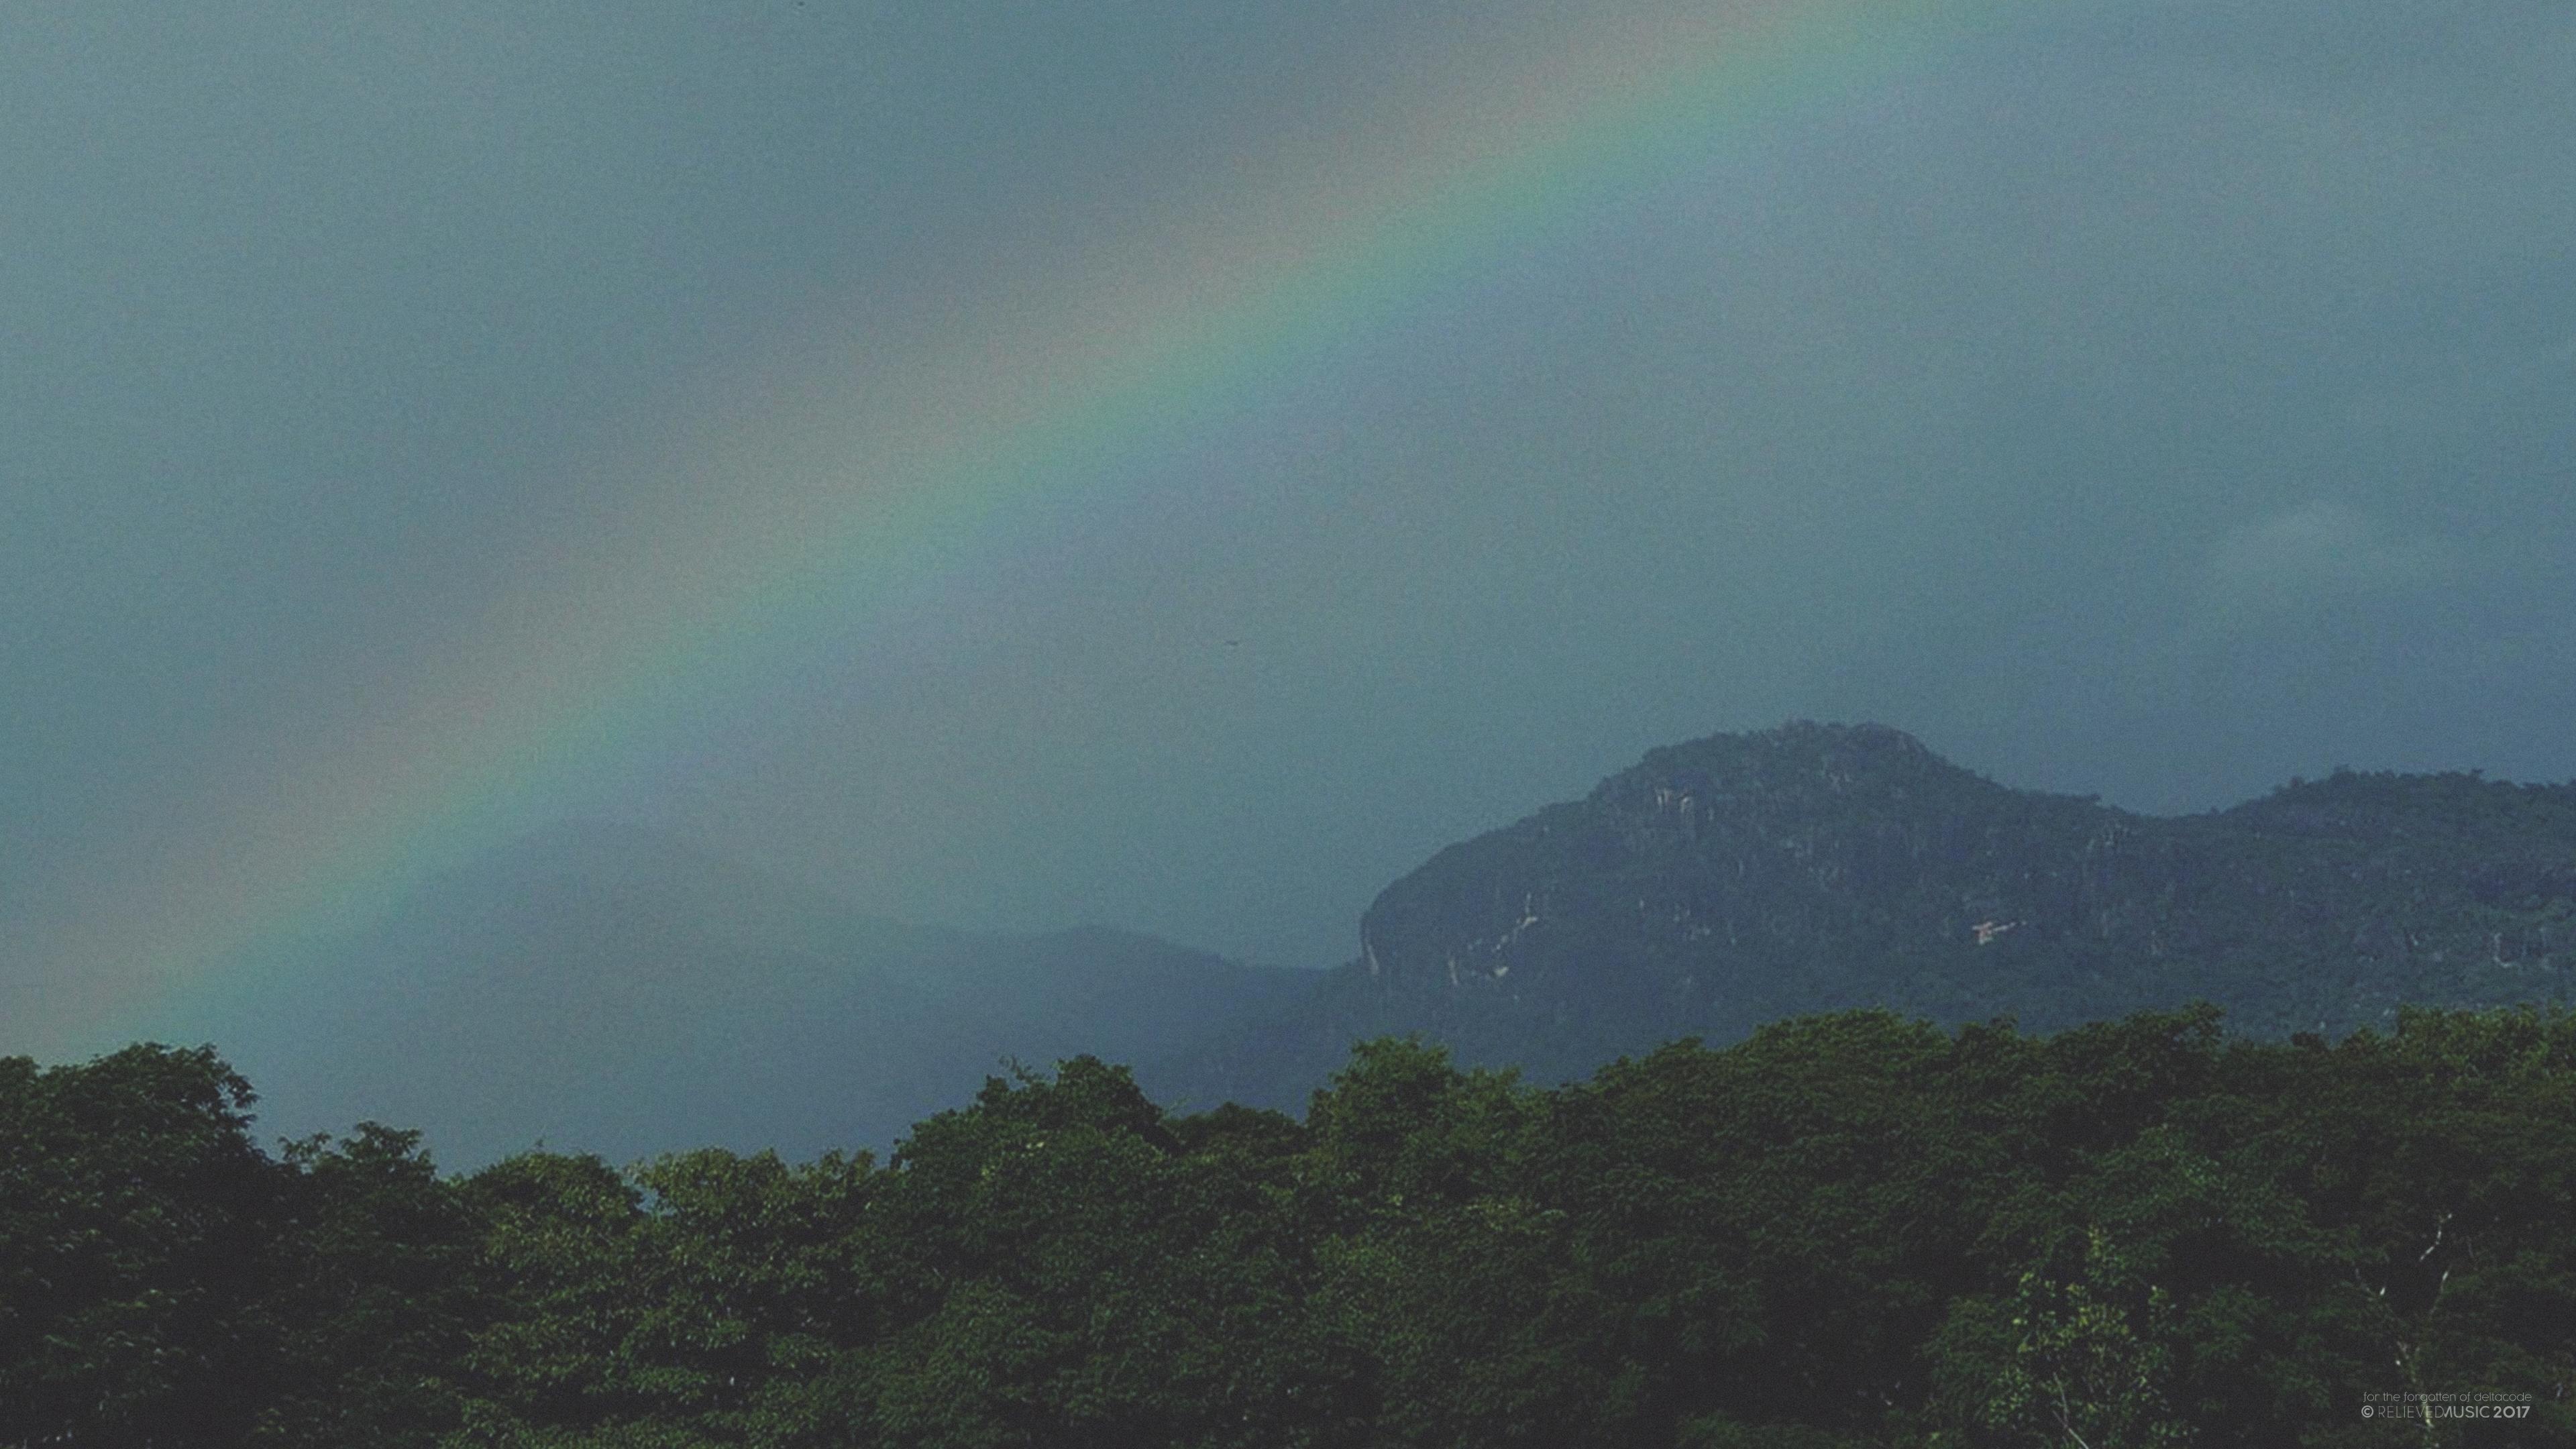 Wallpaper : pemandangan, pelangi, pegunungan 3840x2160